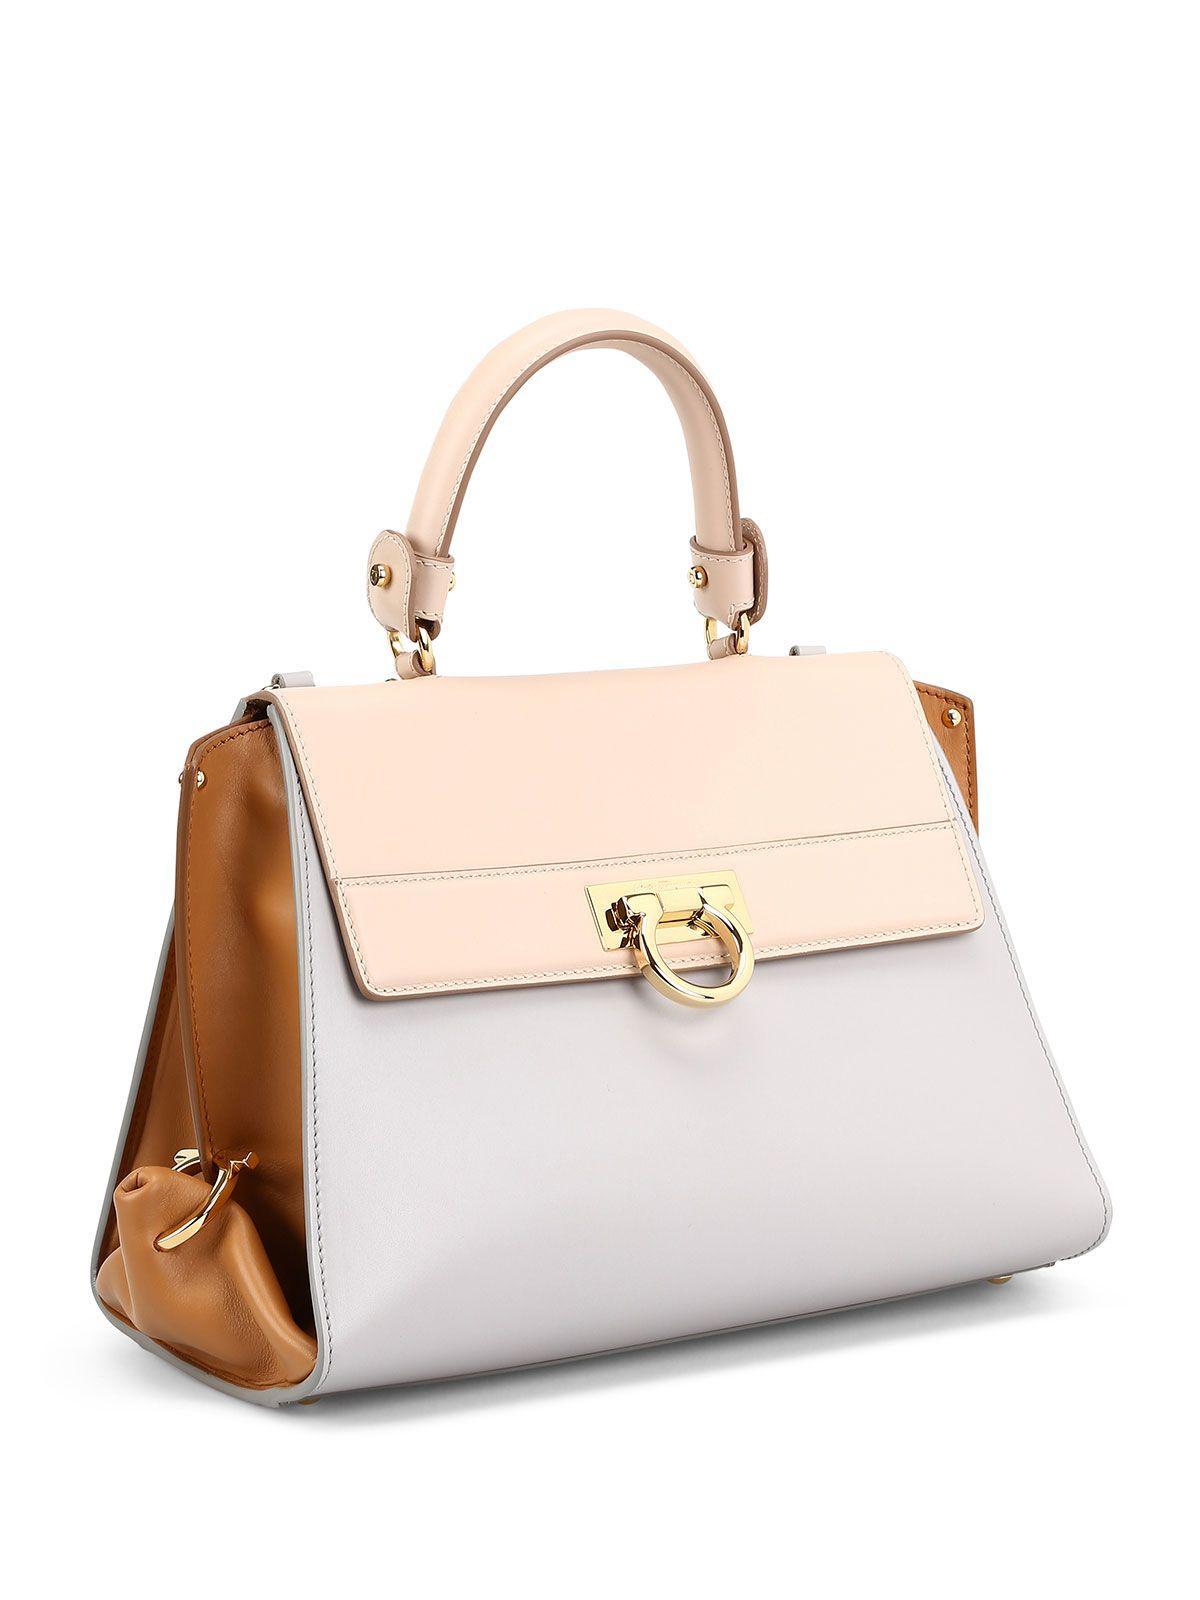 03e95b98463 Salvatore Ferragamo Sofia Medium Tote   Handbags   Pinterest ...